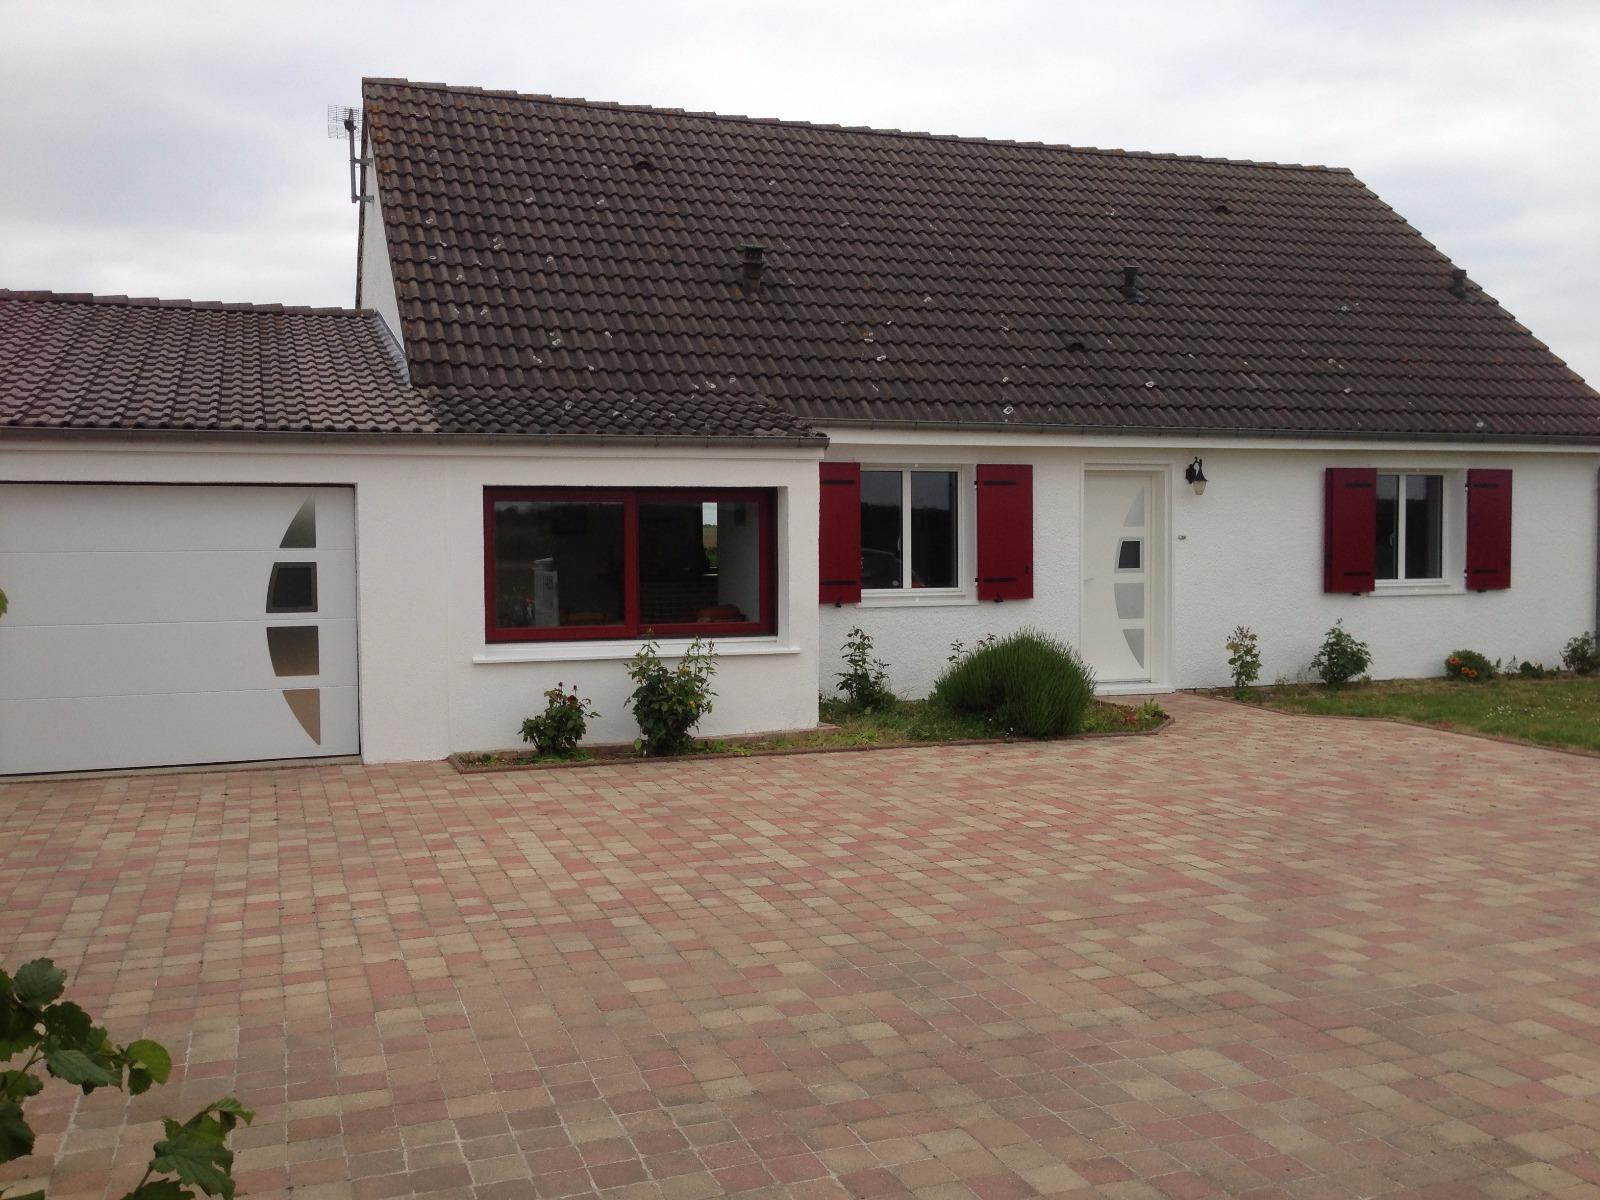 Porte d'entrée et porte de garage assorties avec insert inox - RUE (80)